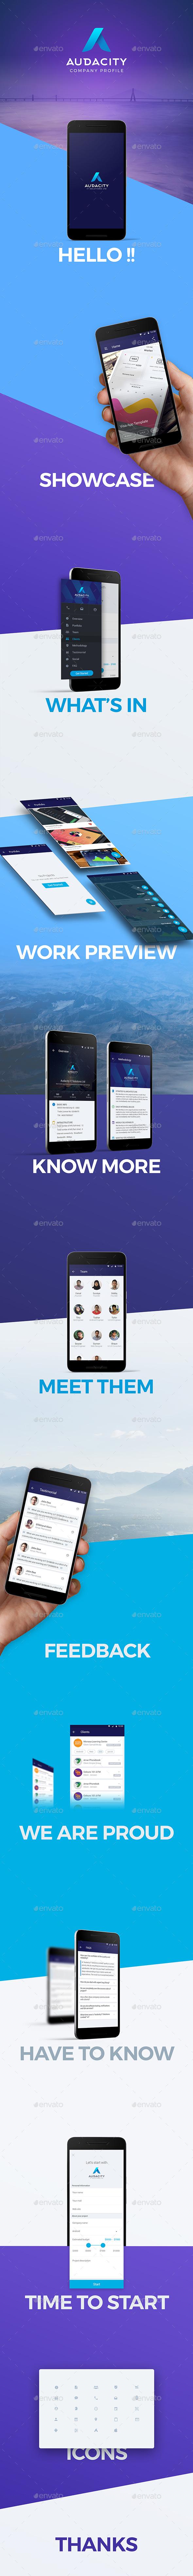 Audacity - Company Profile App UI Kit - User Interfaces Web Elements